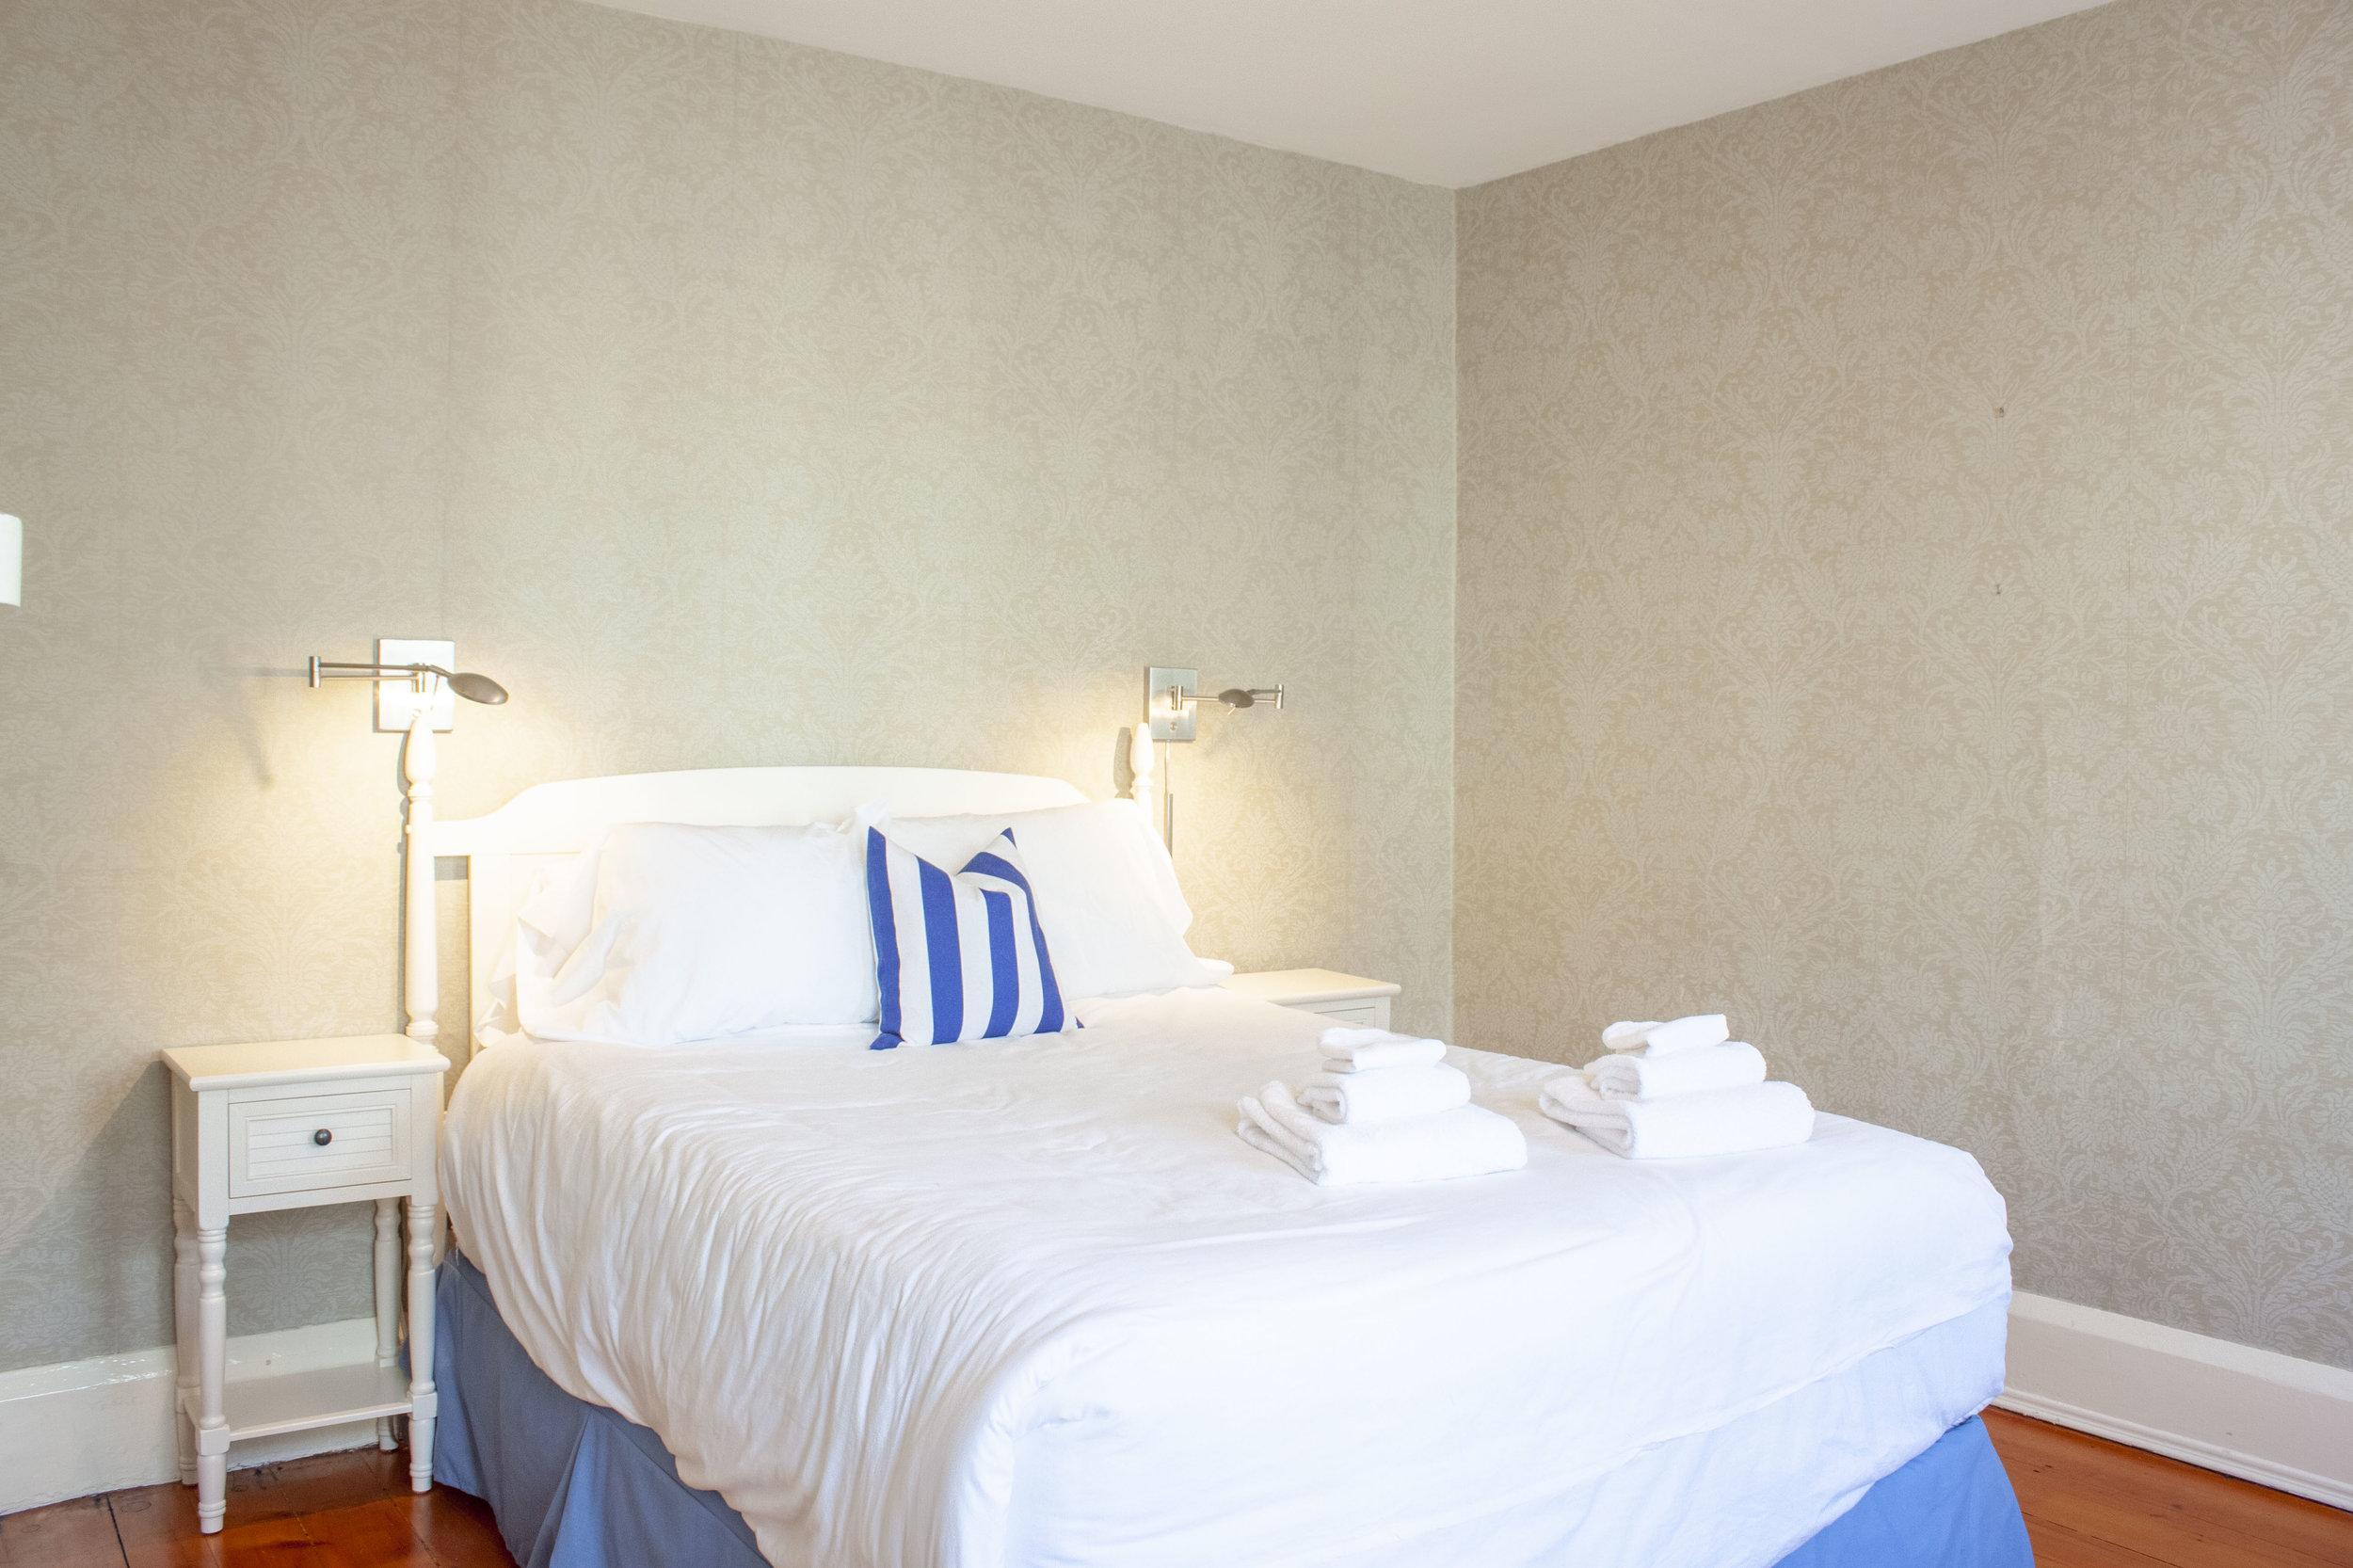 HH_Room1_2.jpg